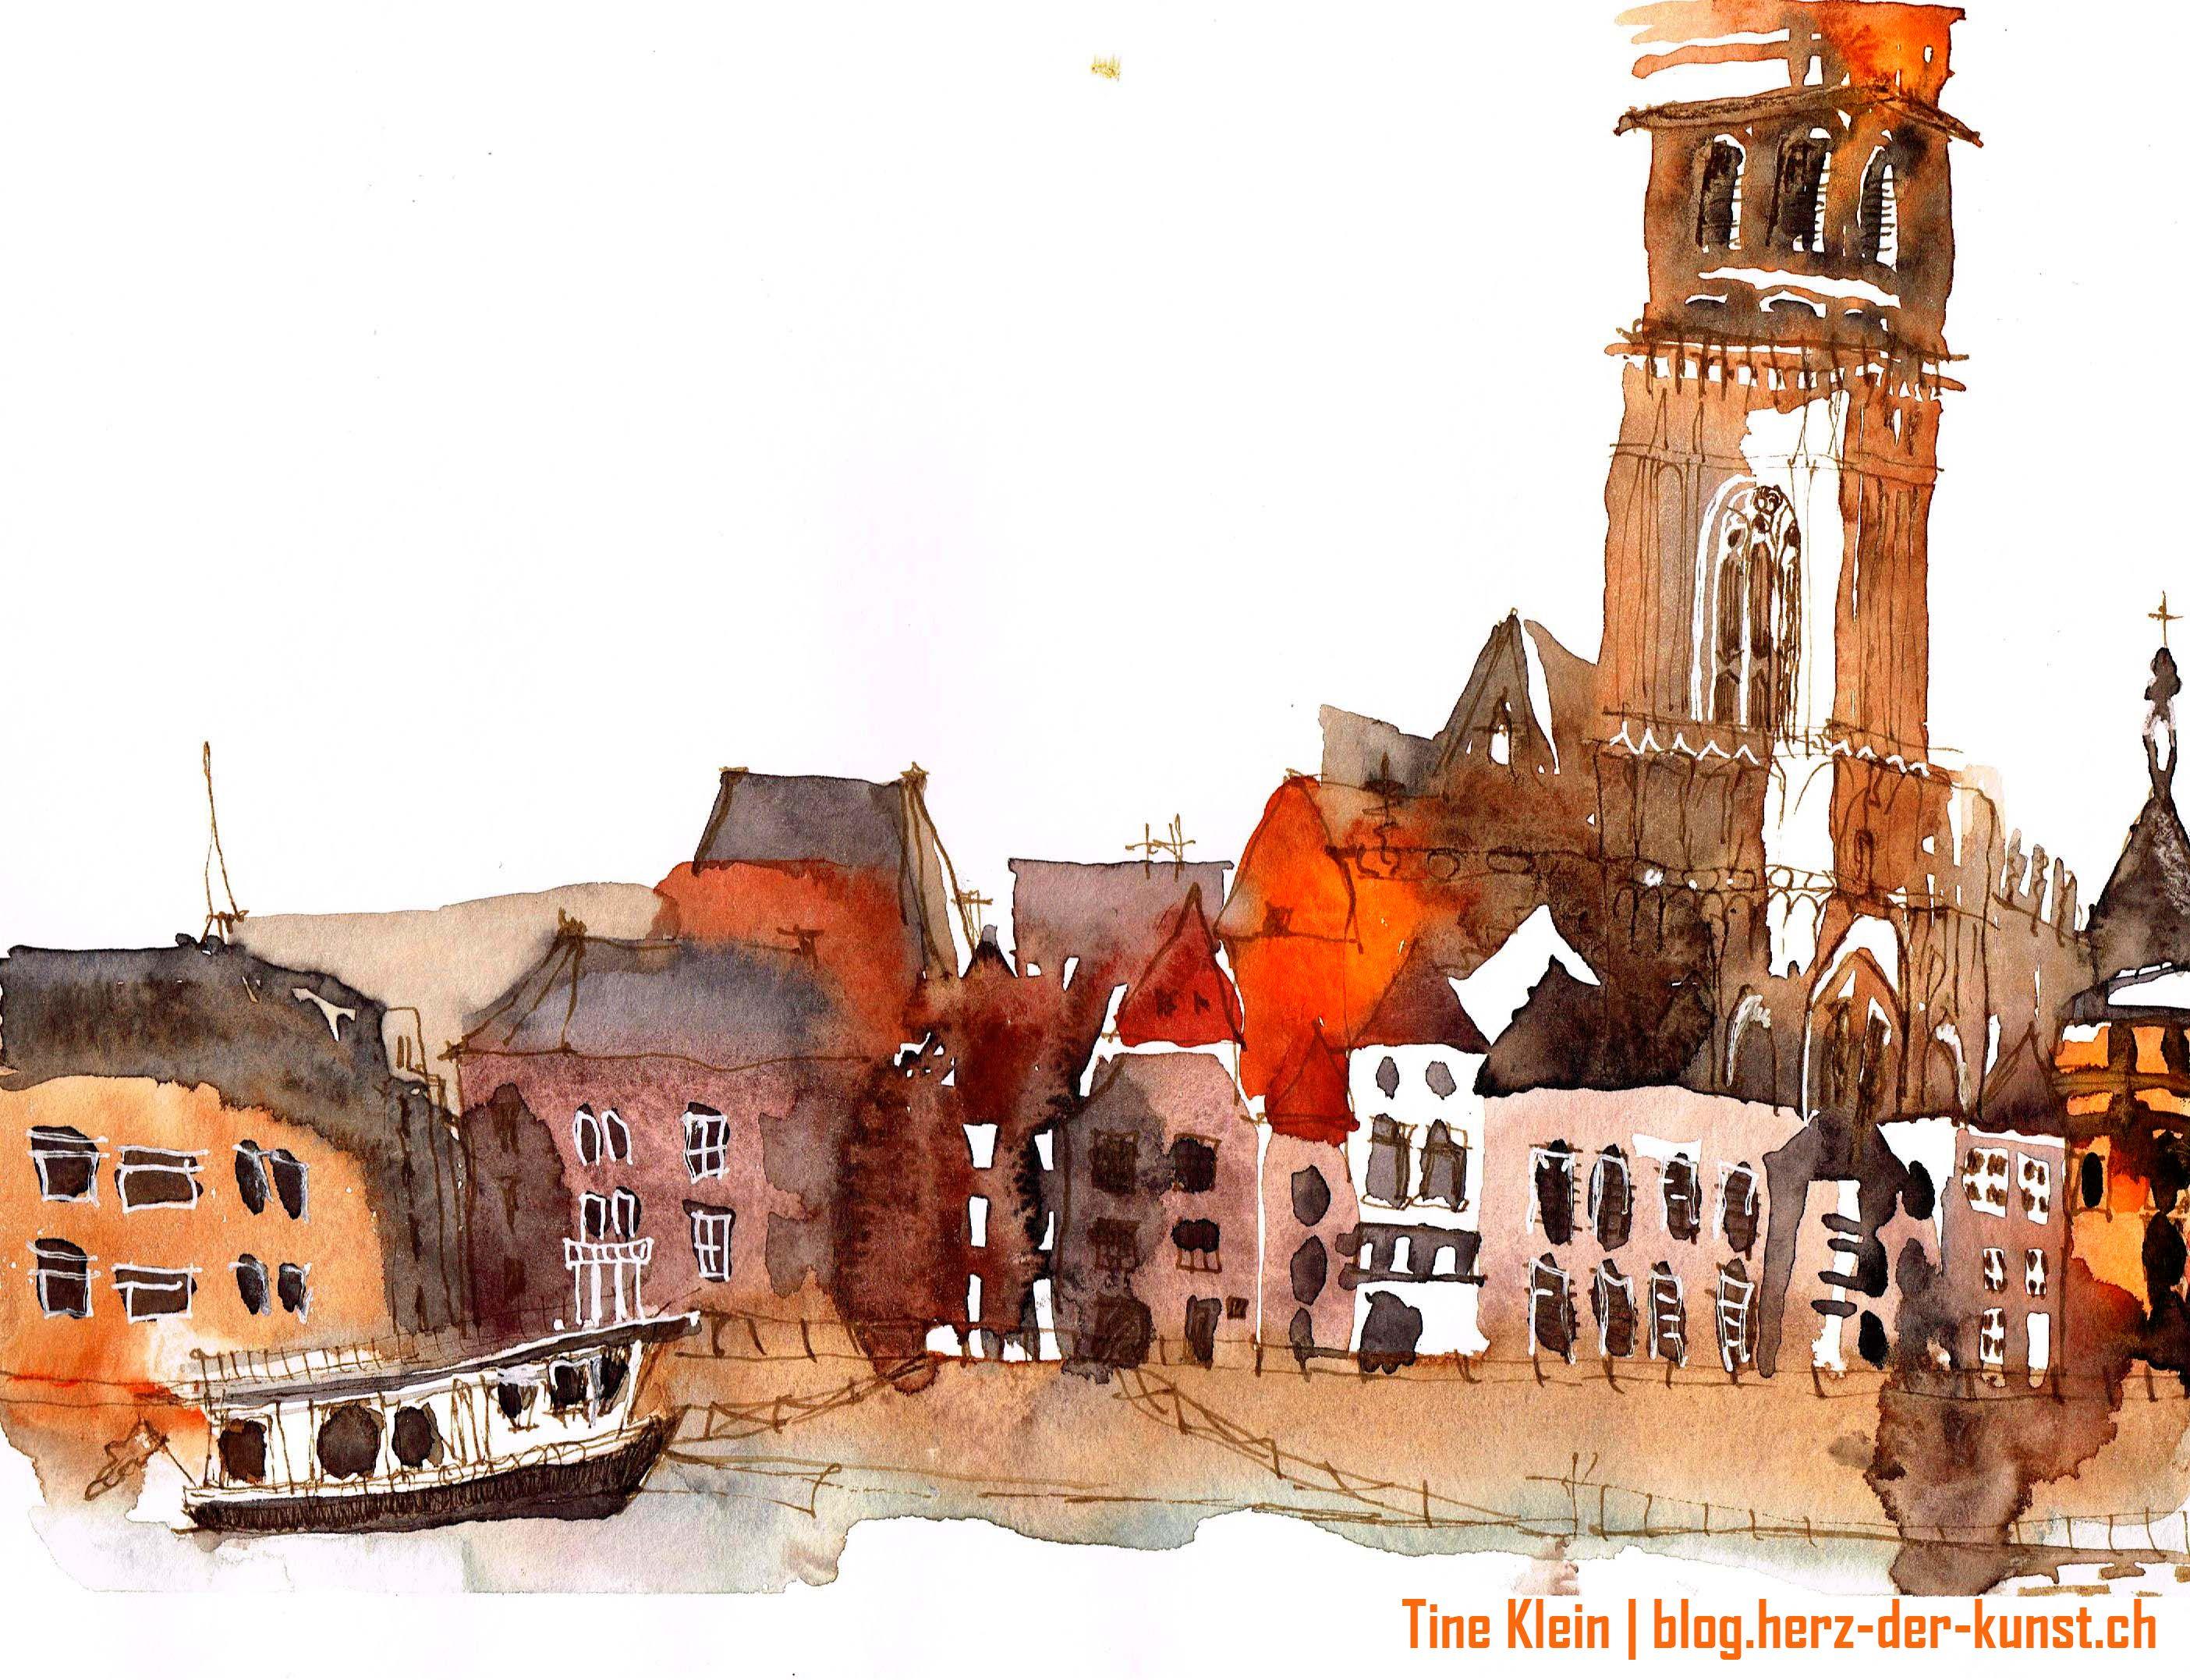 Meubelspuiterij deventer ~ Deventer riverside tine klein is an artist which is creating a